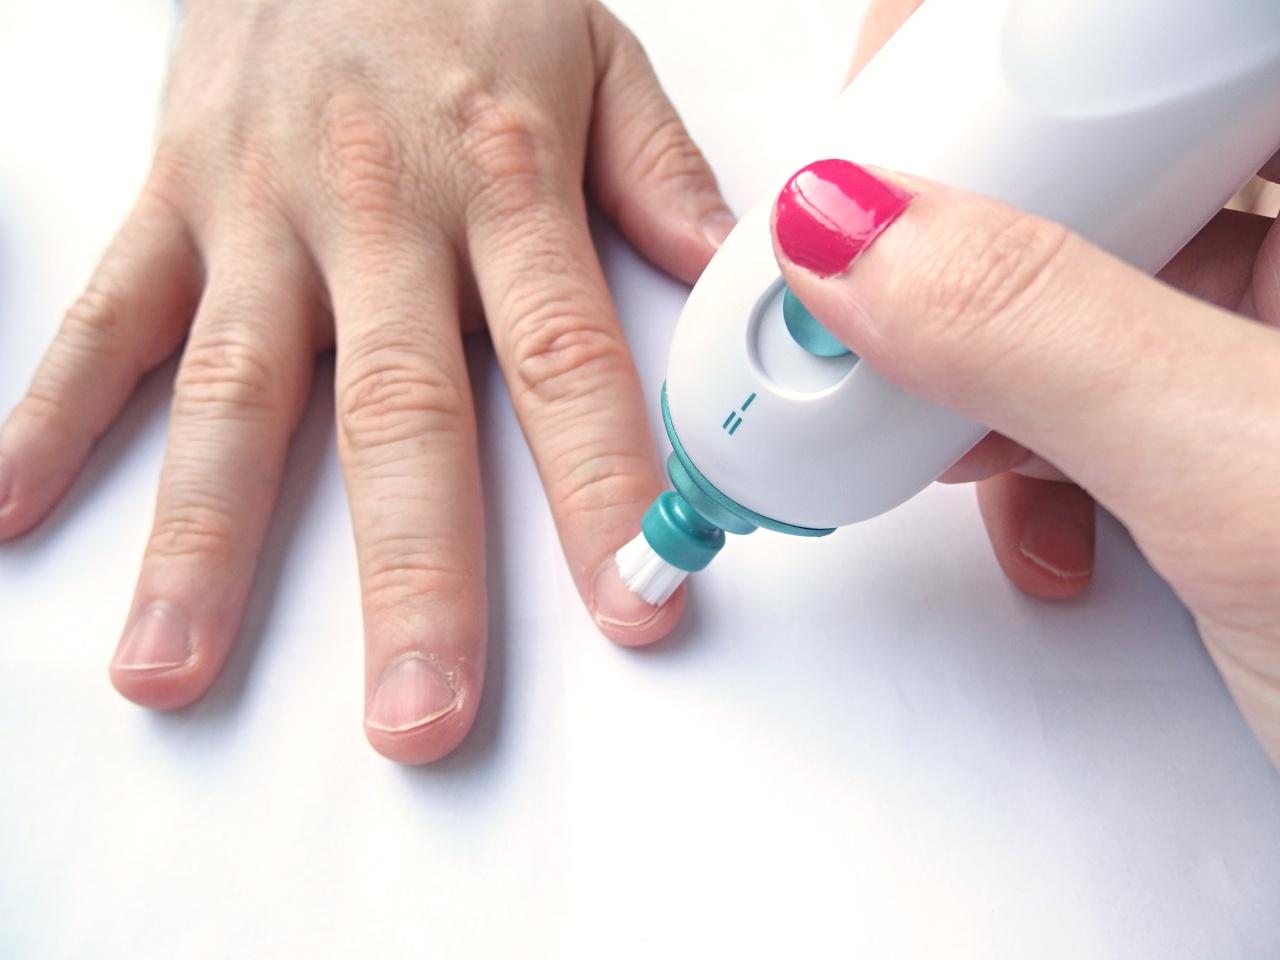 Scholl Nail Beauty Manicure & Pedicure Set Review